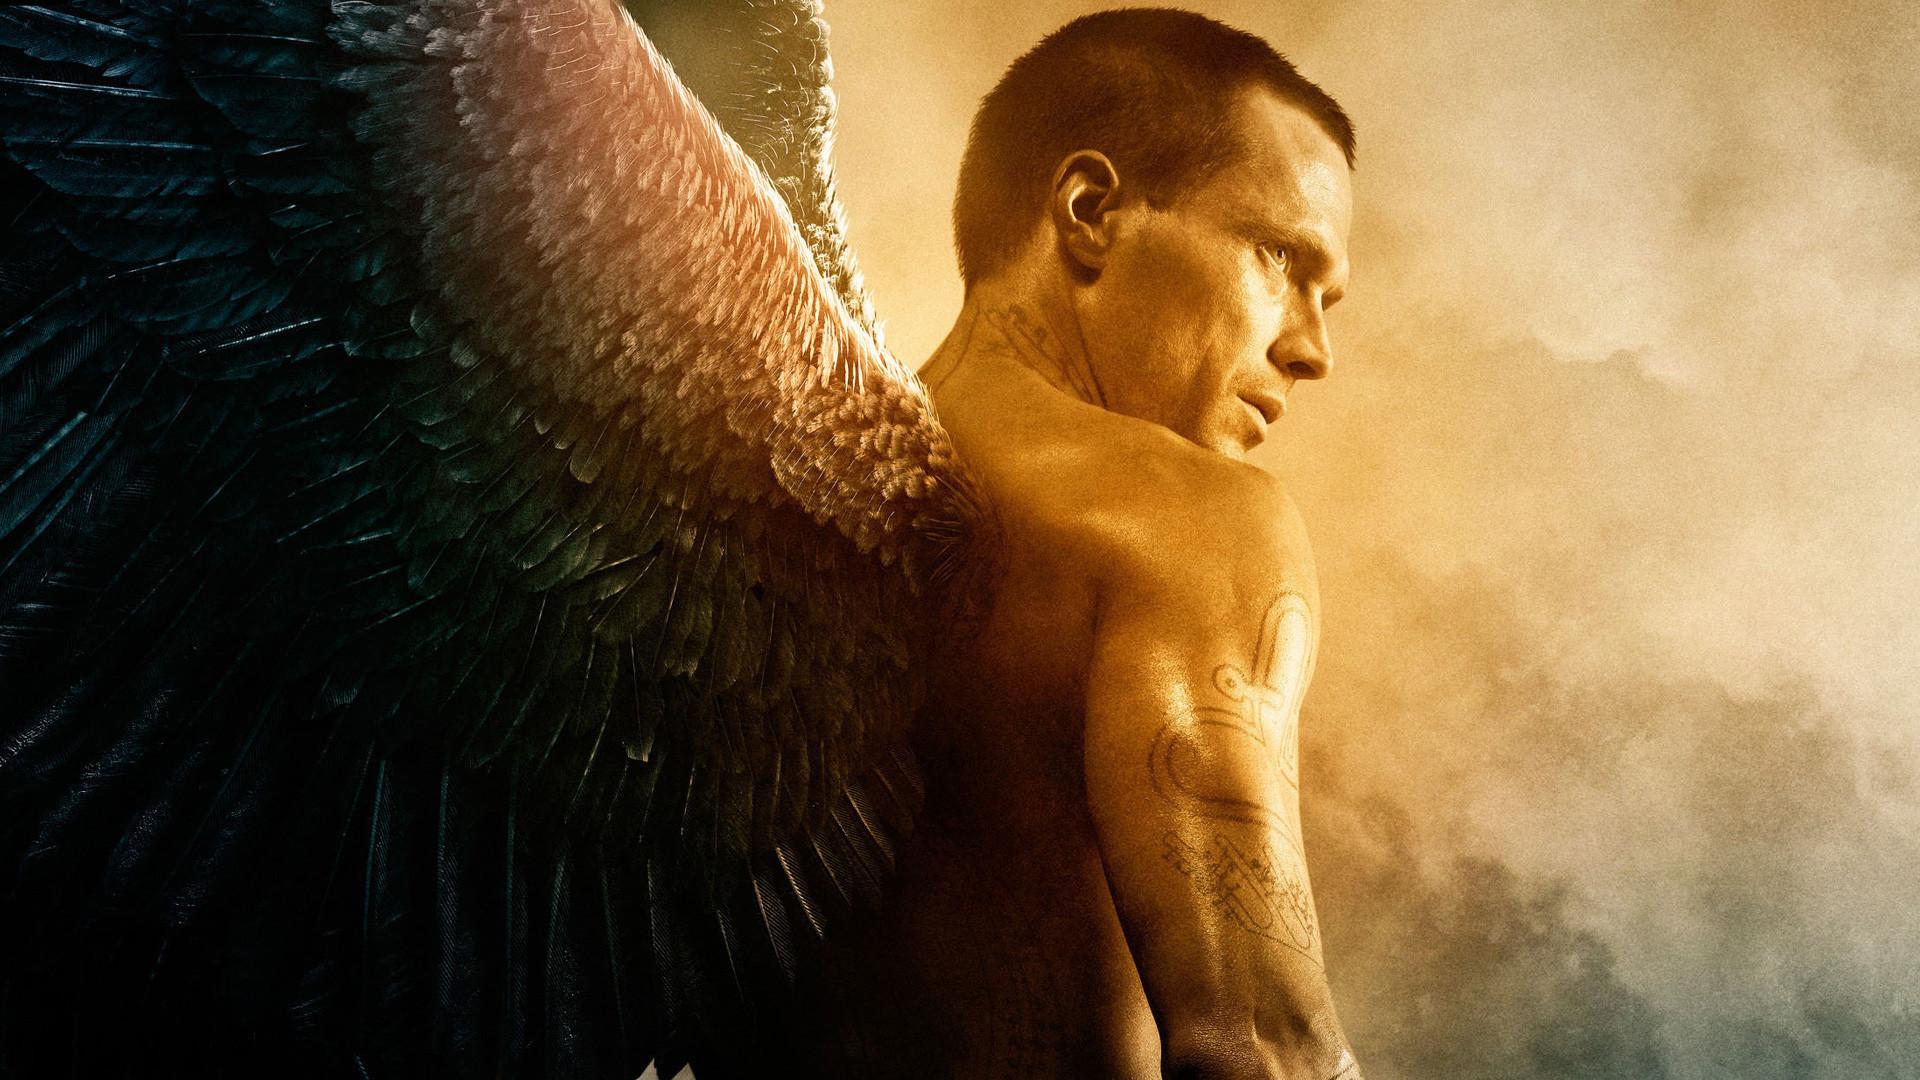 2010 legion movie wallpapers - photo #10